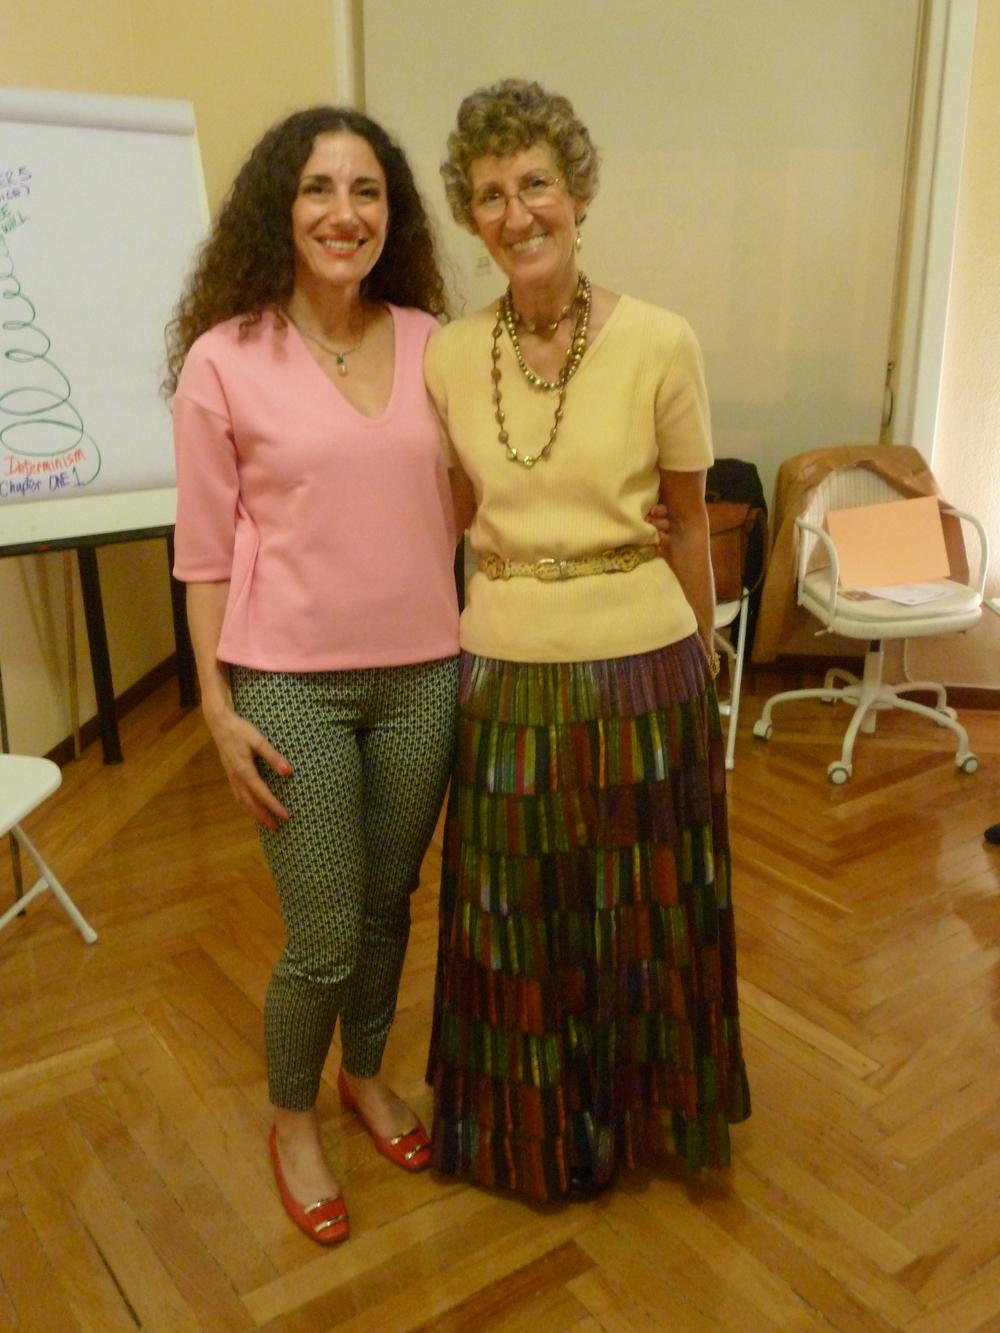 Cristina Campofreddo & Teri-E Belf (1st World Master Coach, Founder of Success Unlimited Network) - Madrid 2014